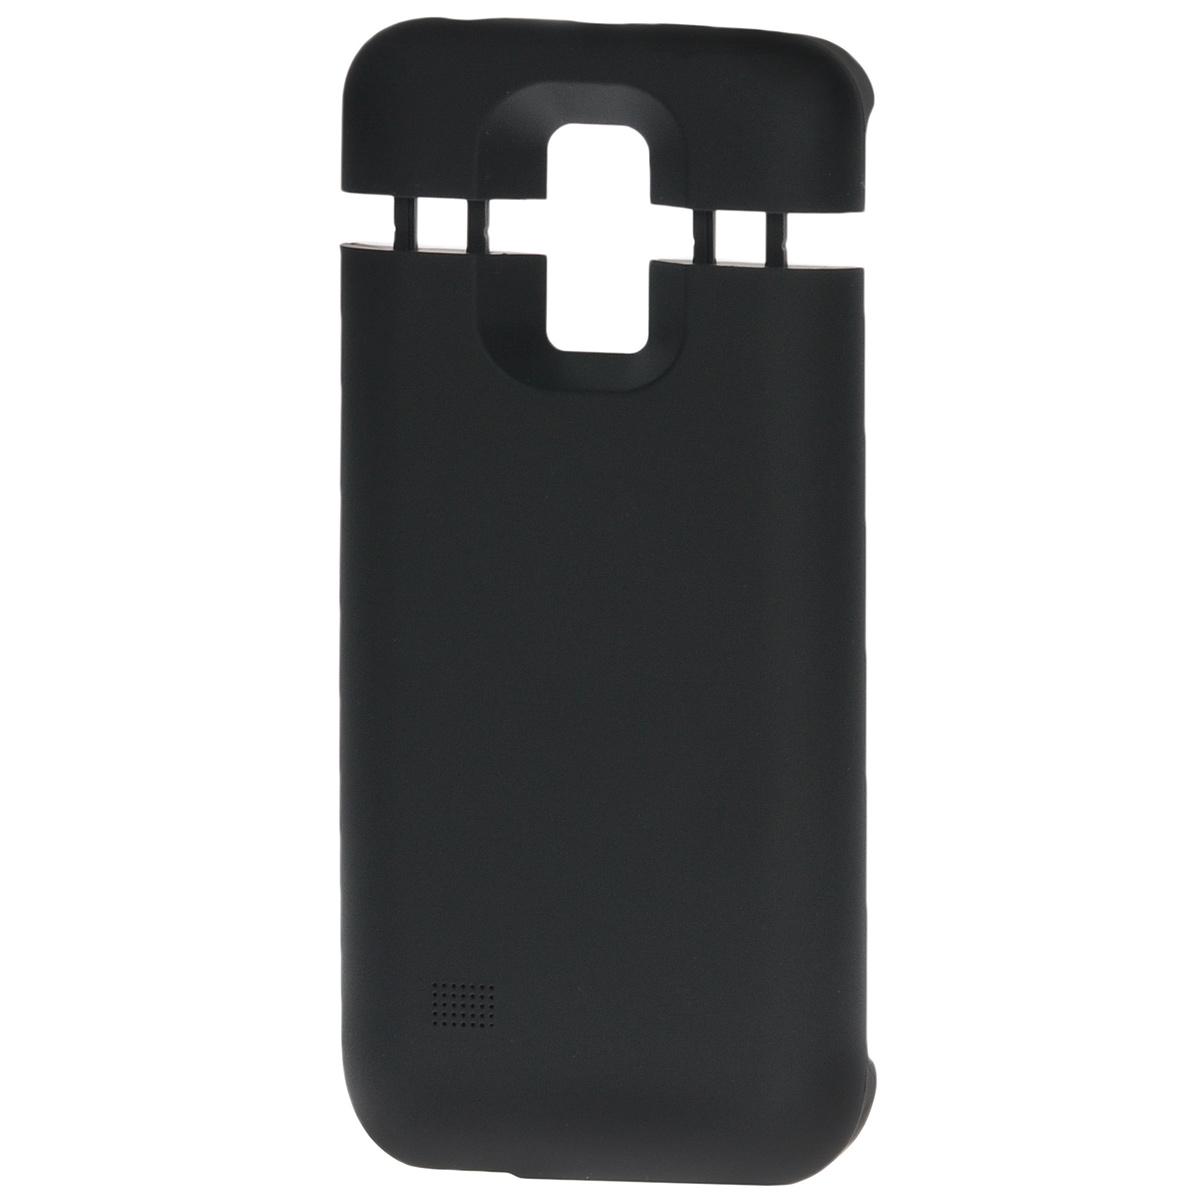 EXEQ HelpinG-SC09 чехол-аккумулятор для Samsung Galaxy S5 mini, Black (3300 мАч, клип-кейс) ( HelpinG-SC09 BL )